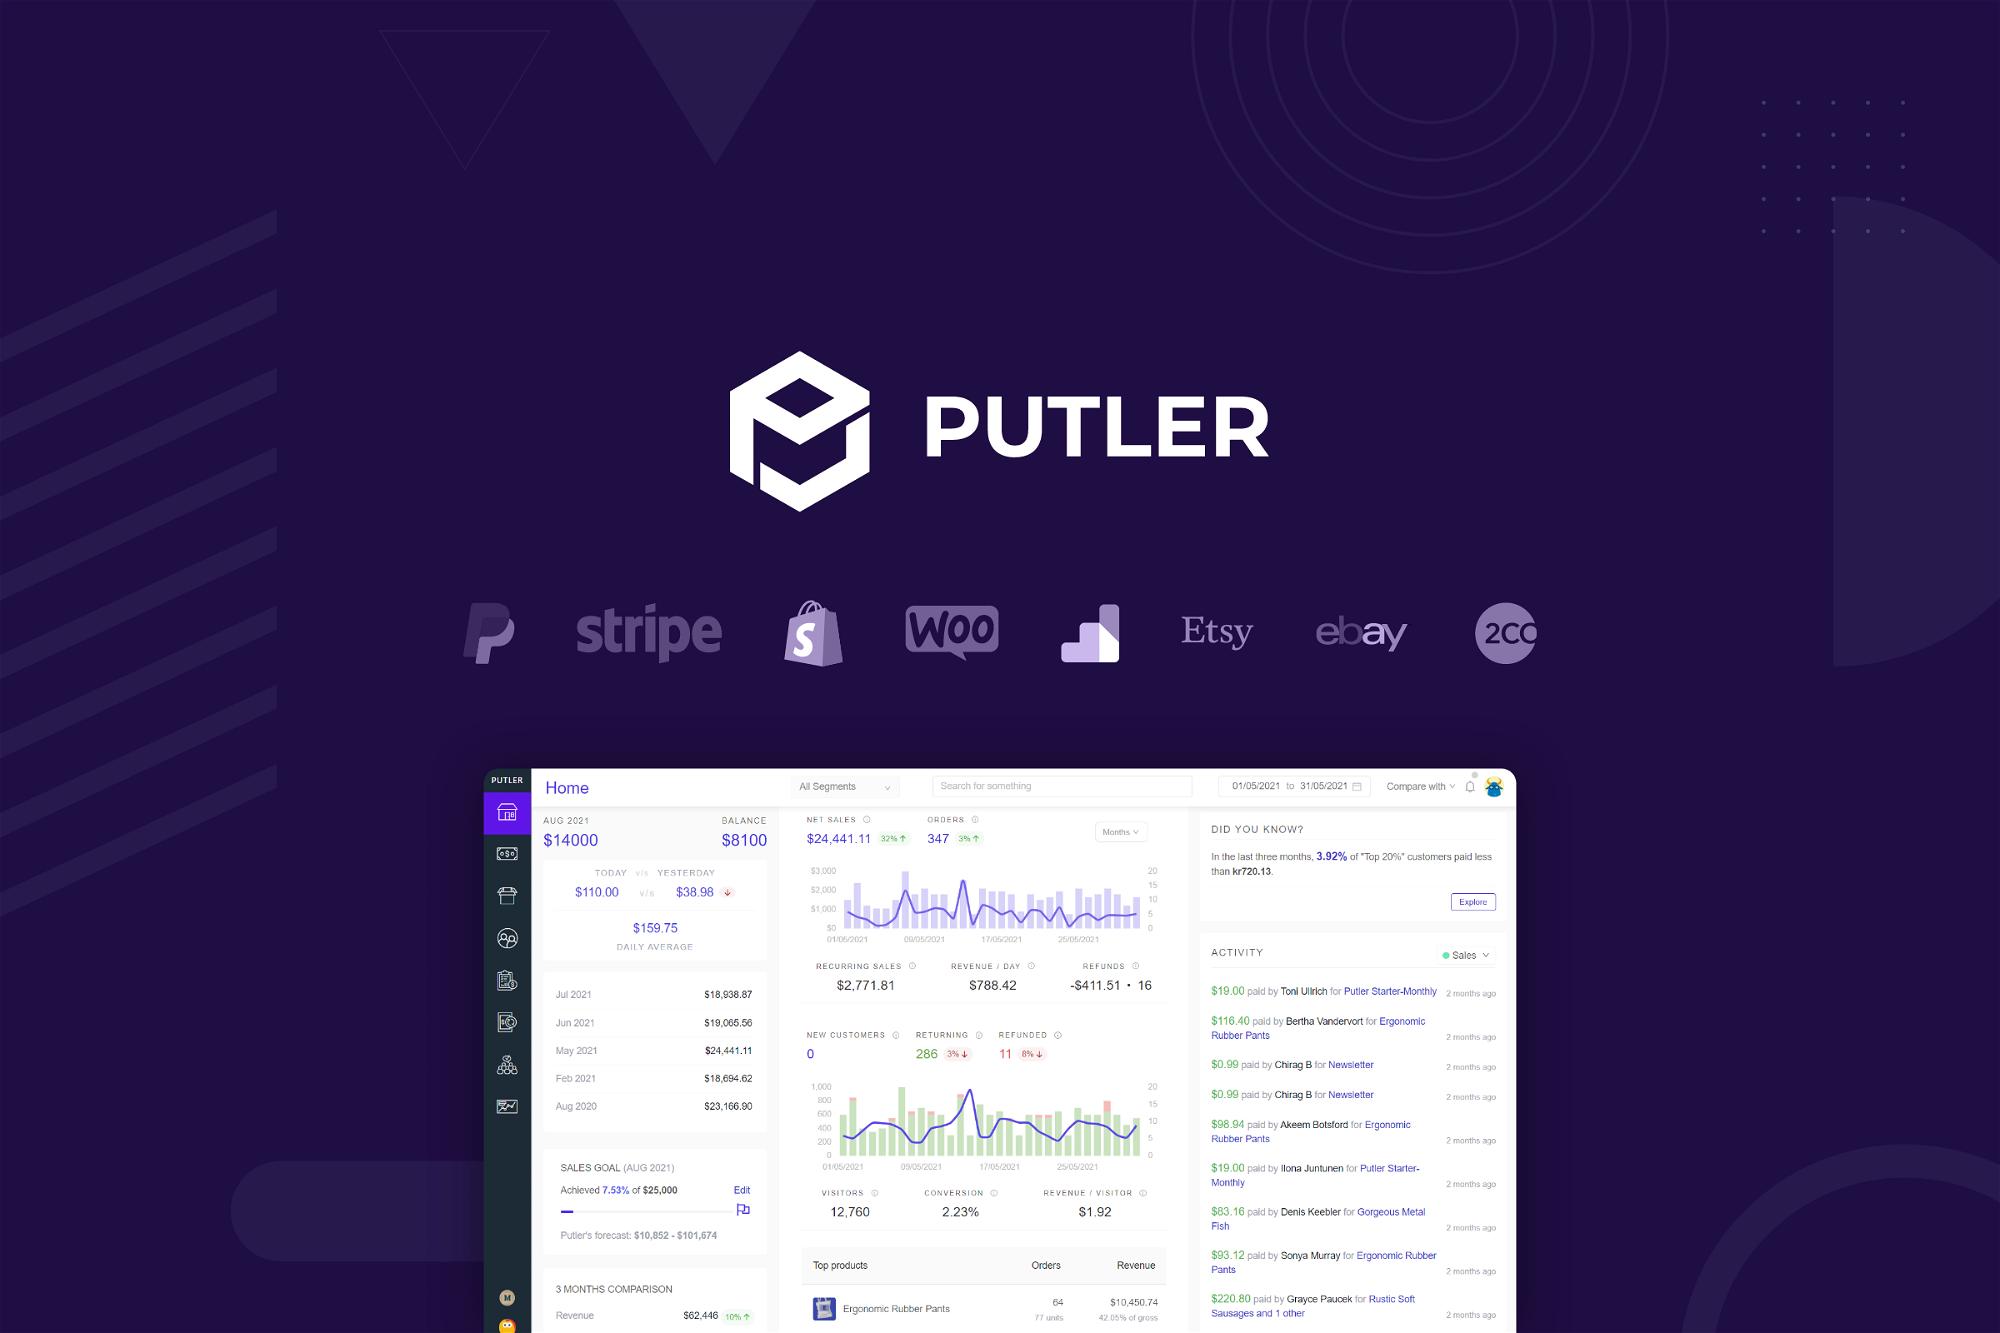 AppSumo Deal for Putler